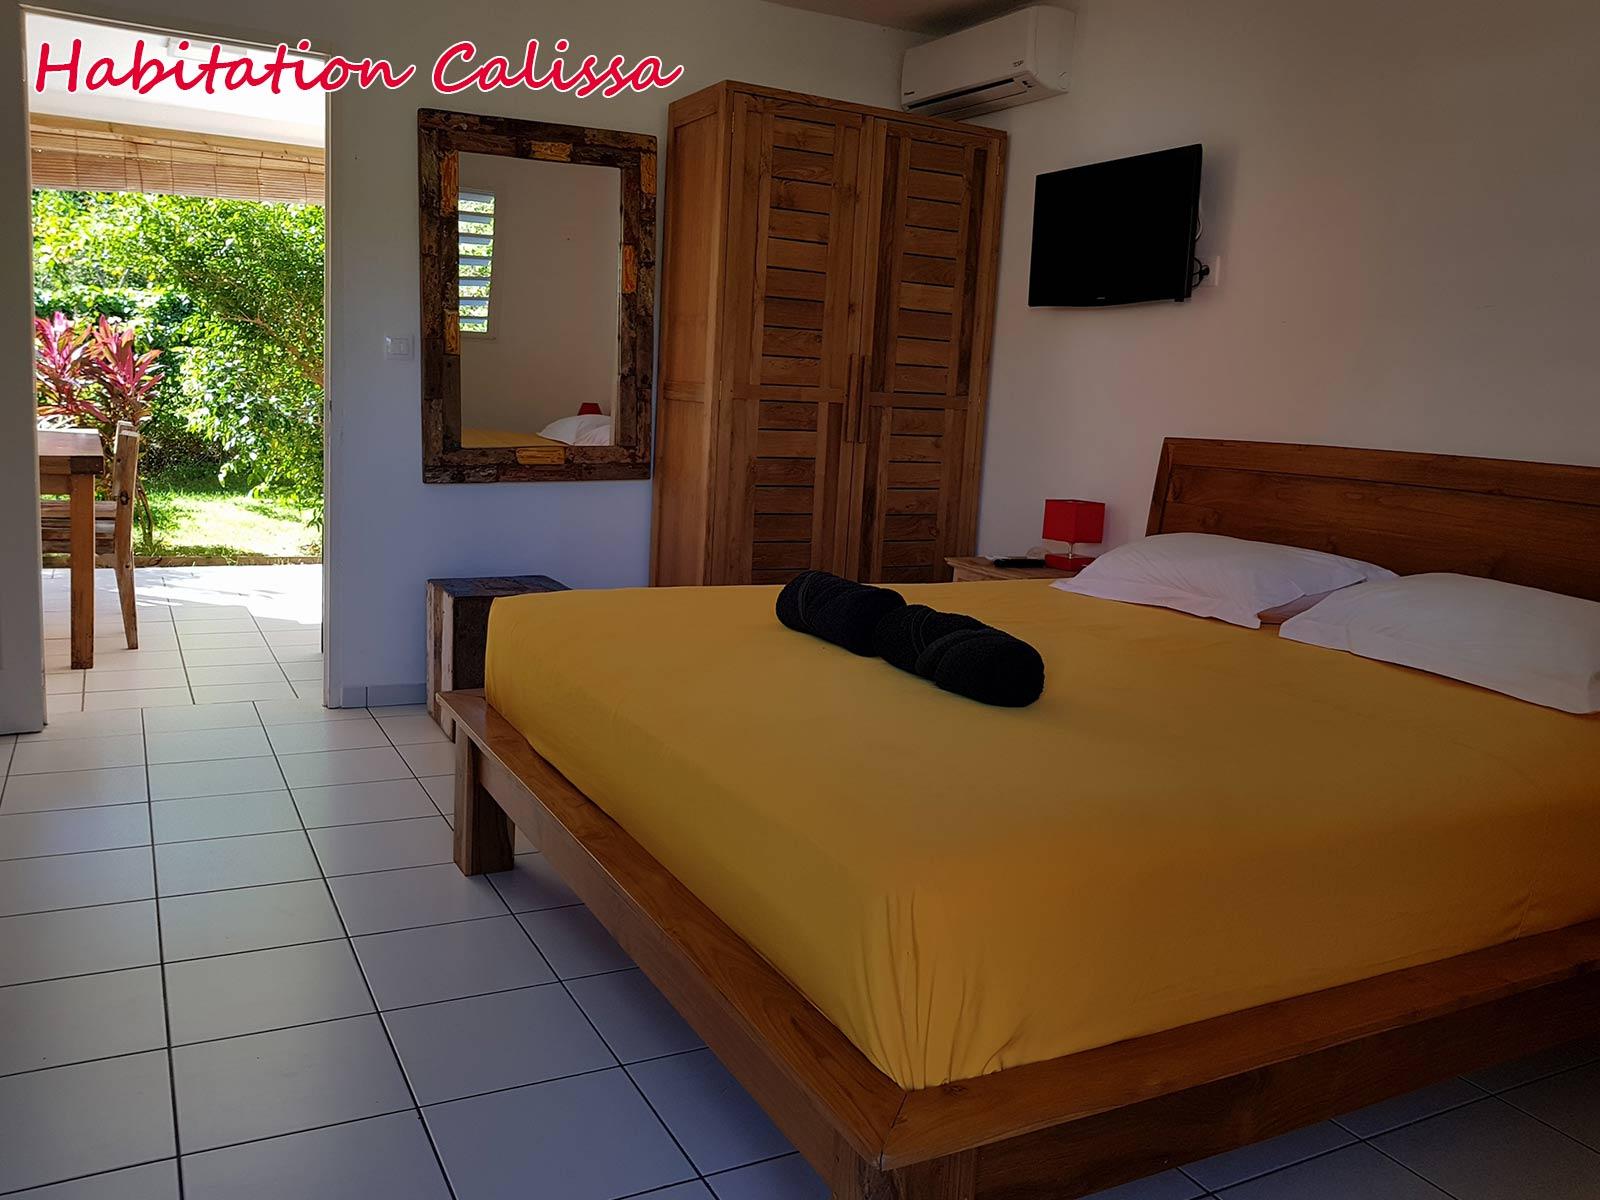 Habitation Calissa - Chambre double